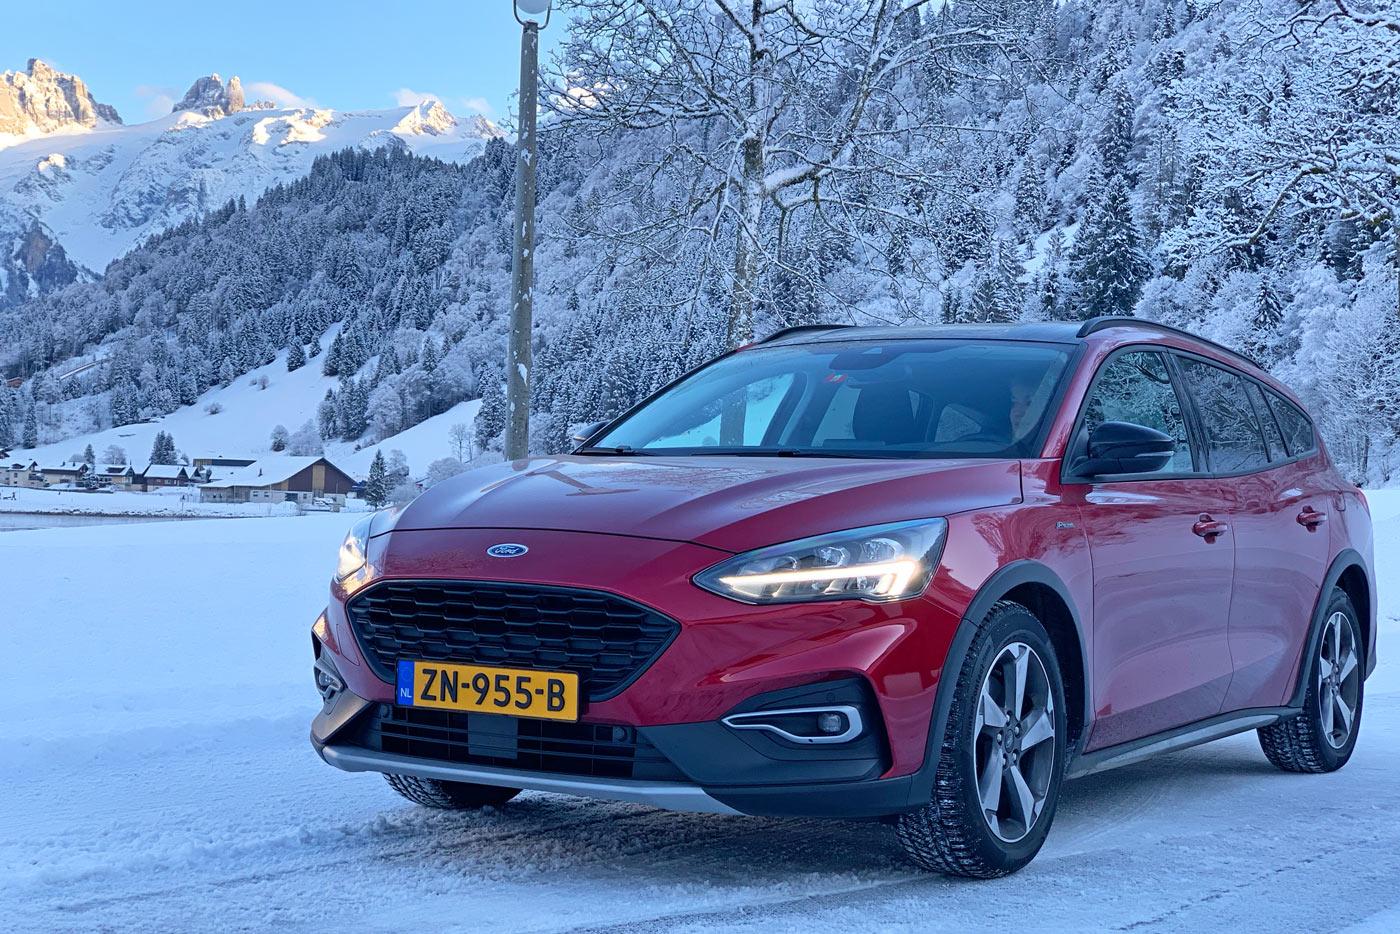 auto in sneeuw op wintersportbestemming